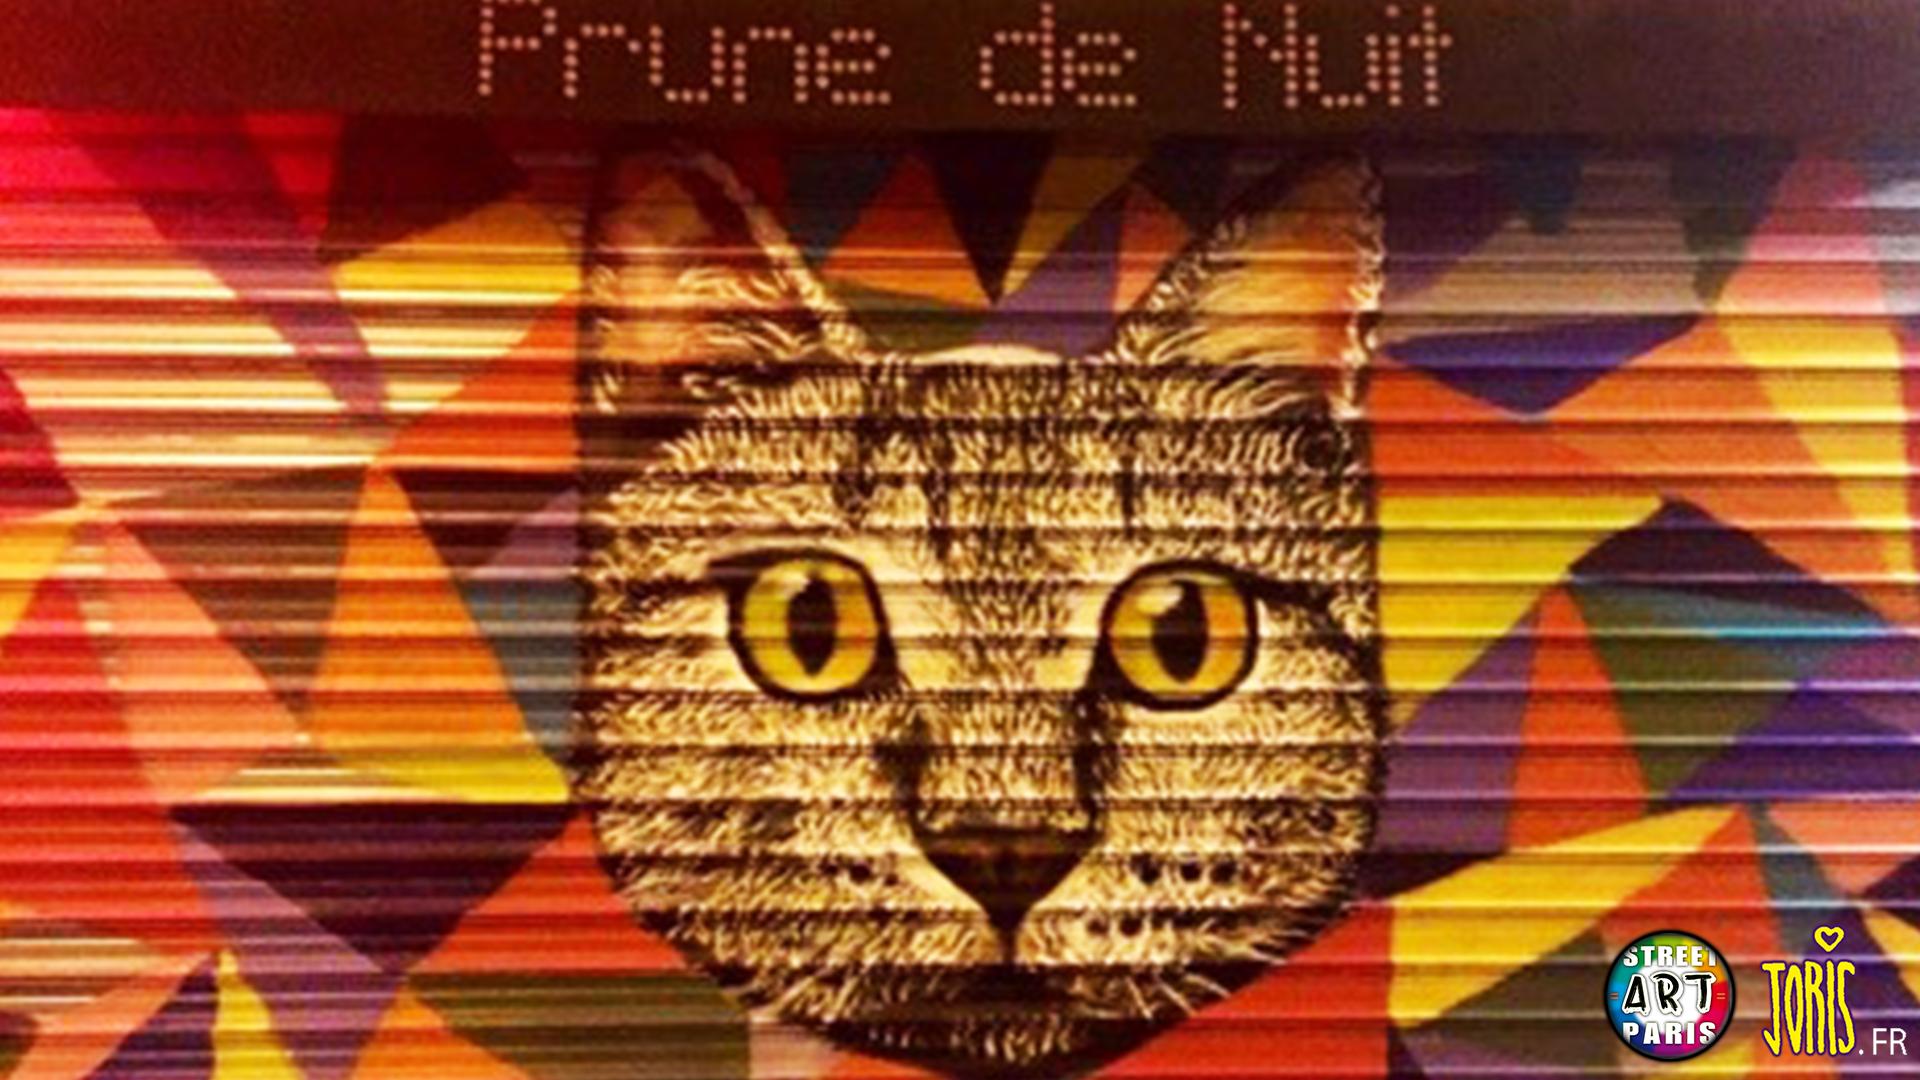 DECORATION-GRAFFITI-FRESQUE-TABLEAU-STREET-ART-PARIS-22